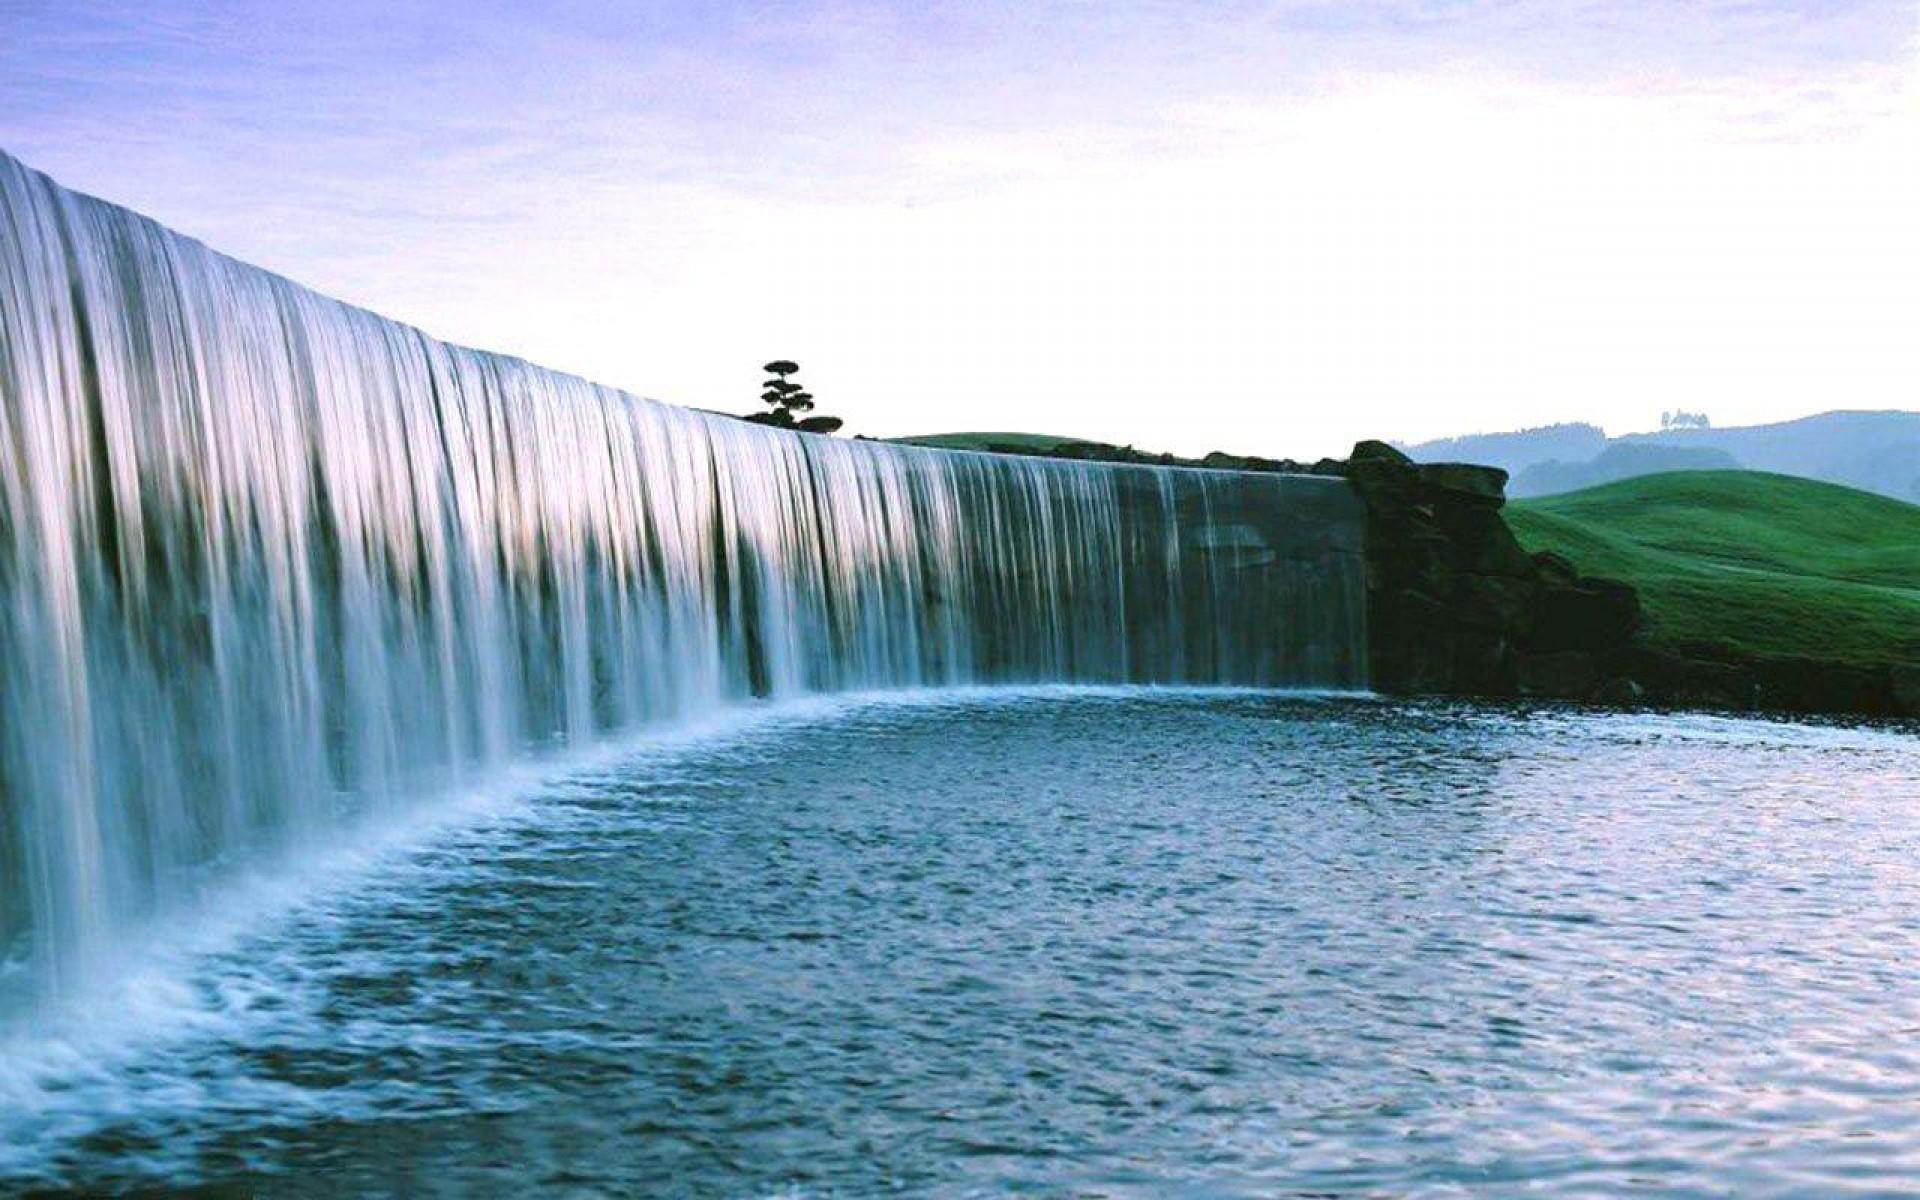 Nung Waterfall 00005